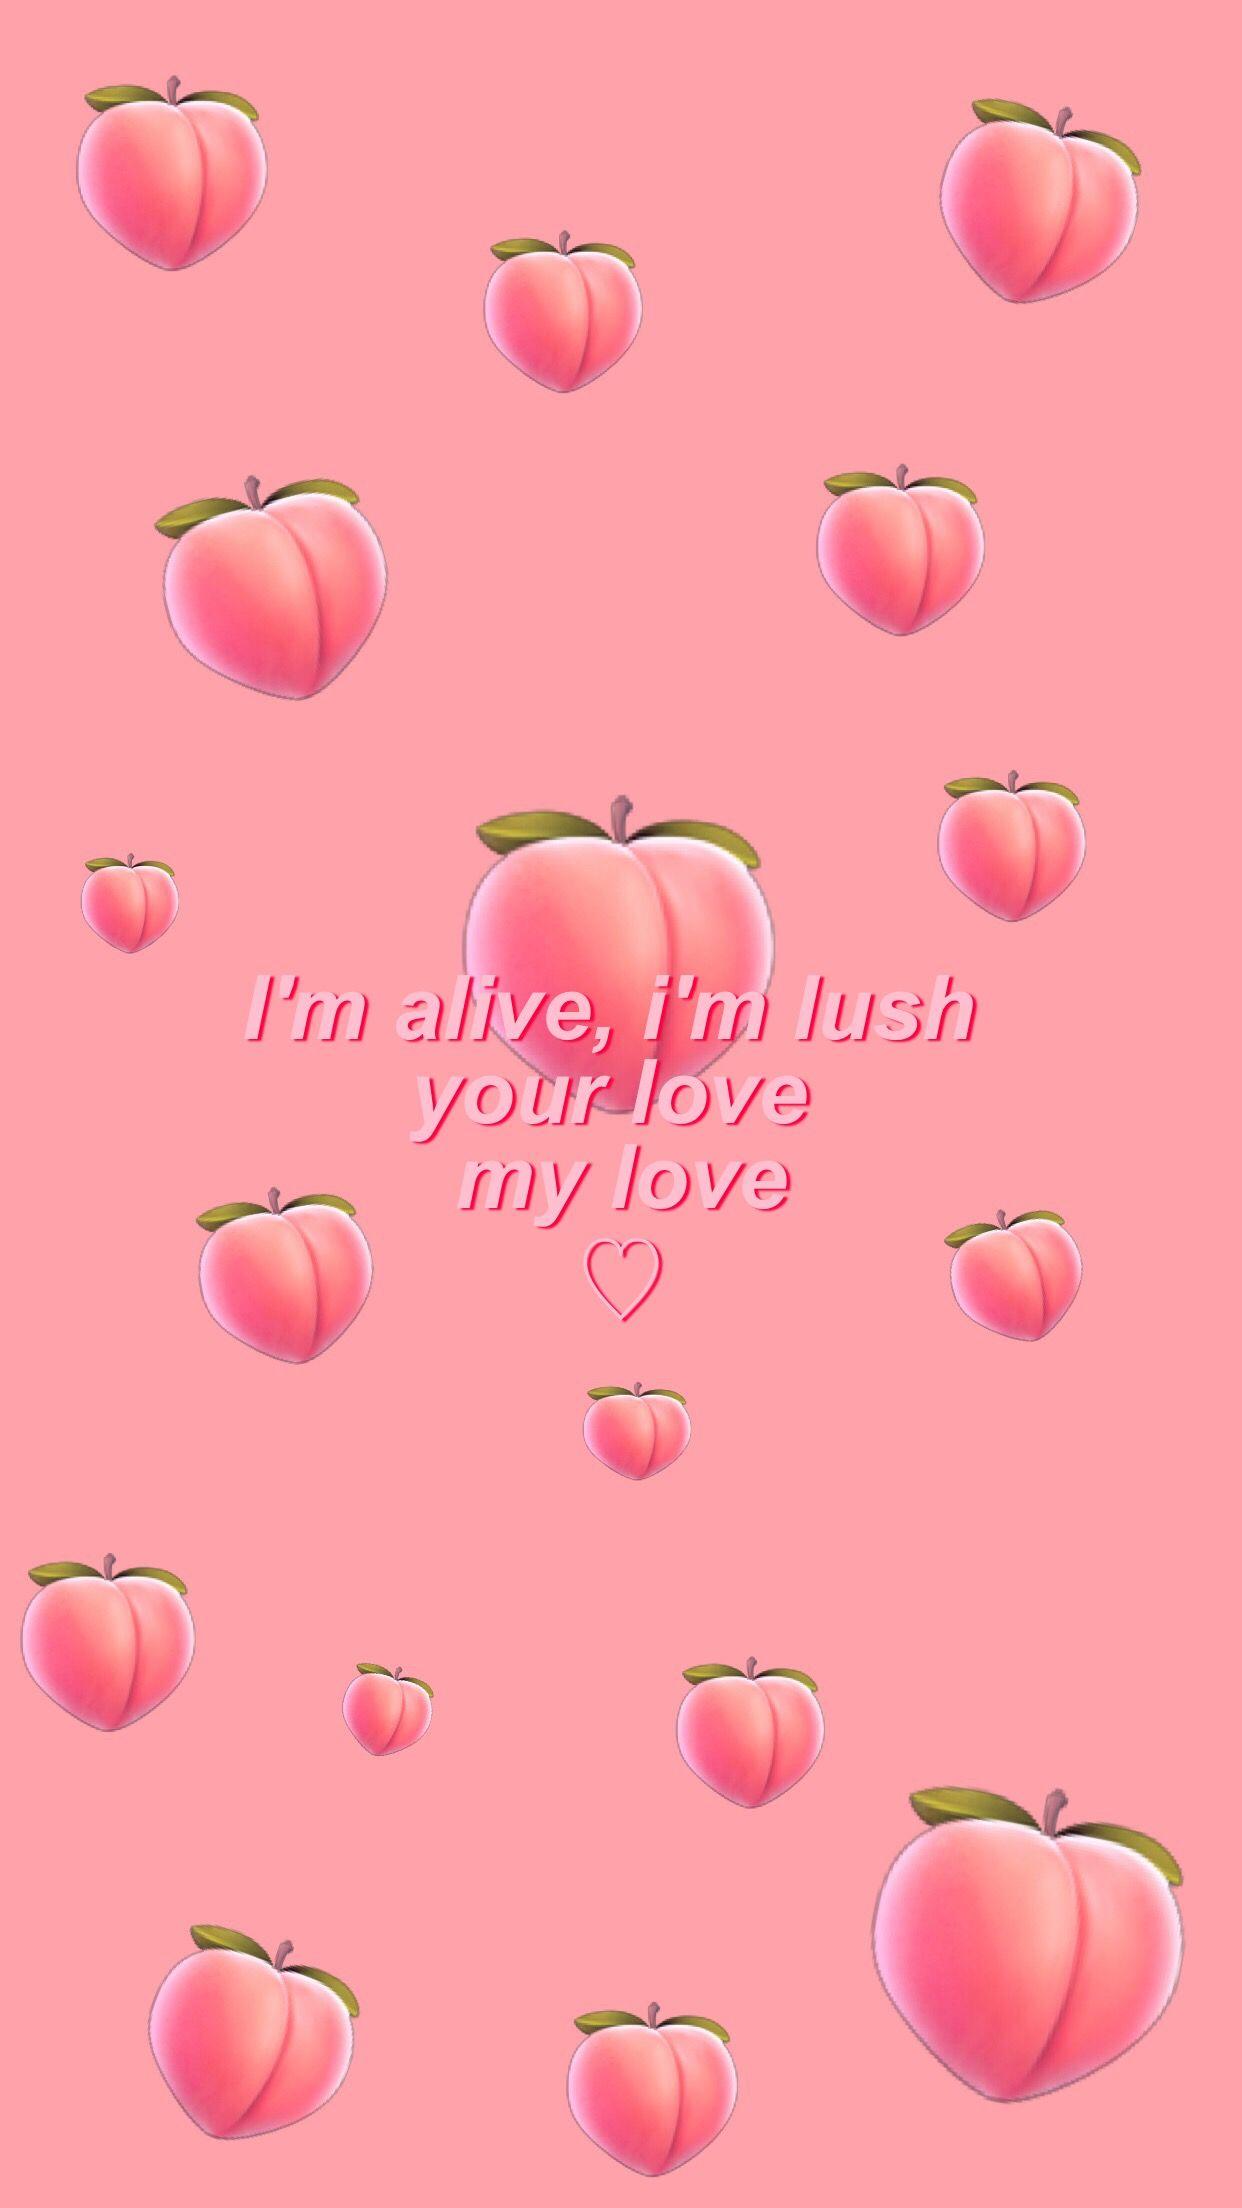 Kawaii Aesthetic Peach Background - HD Wallpaper